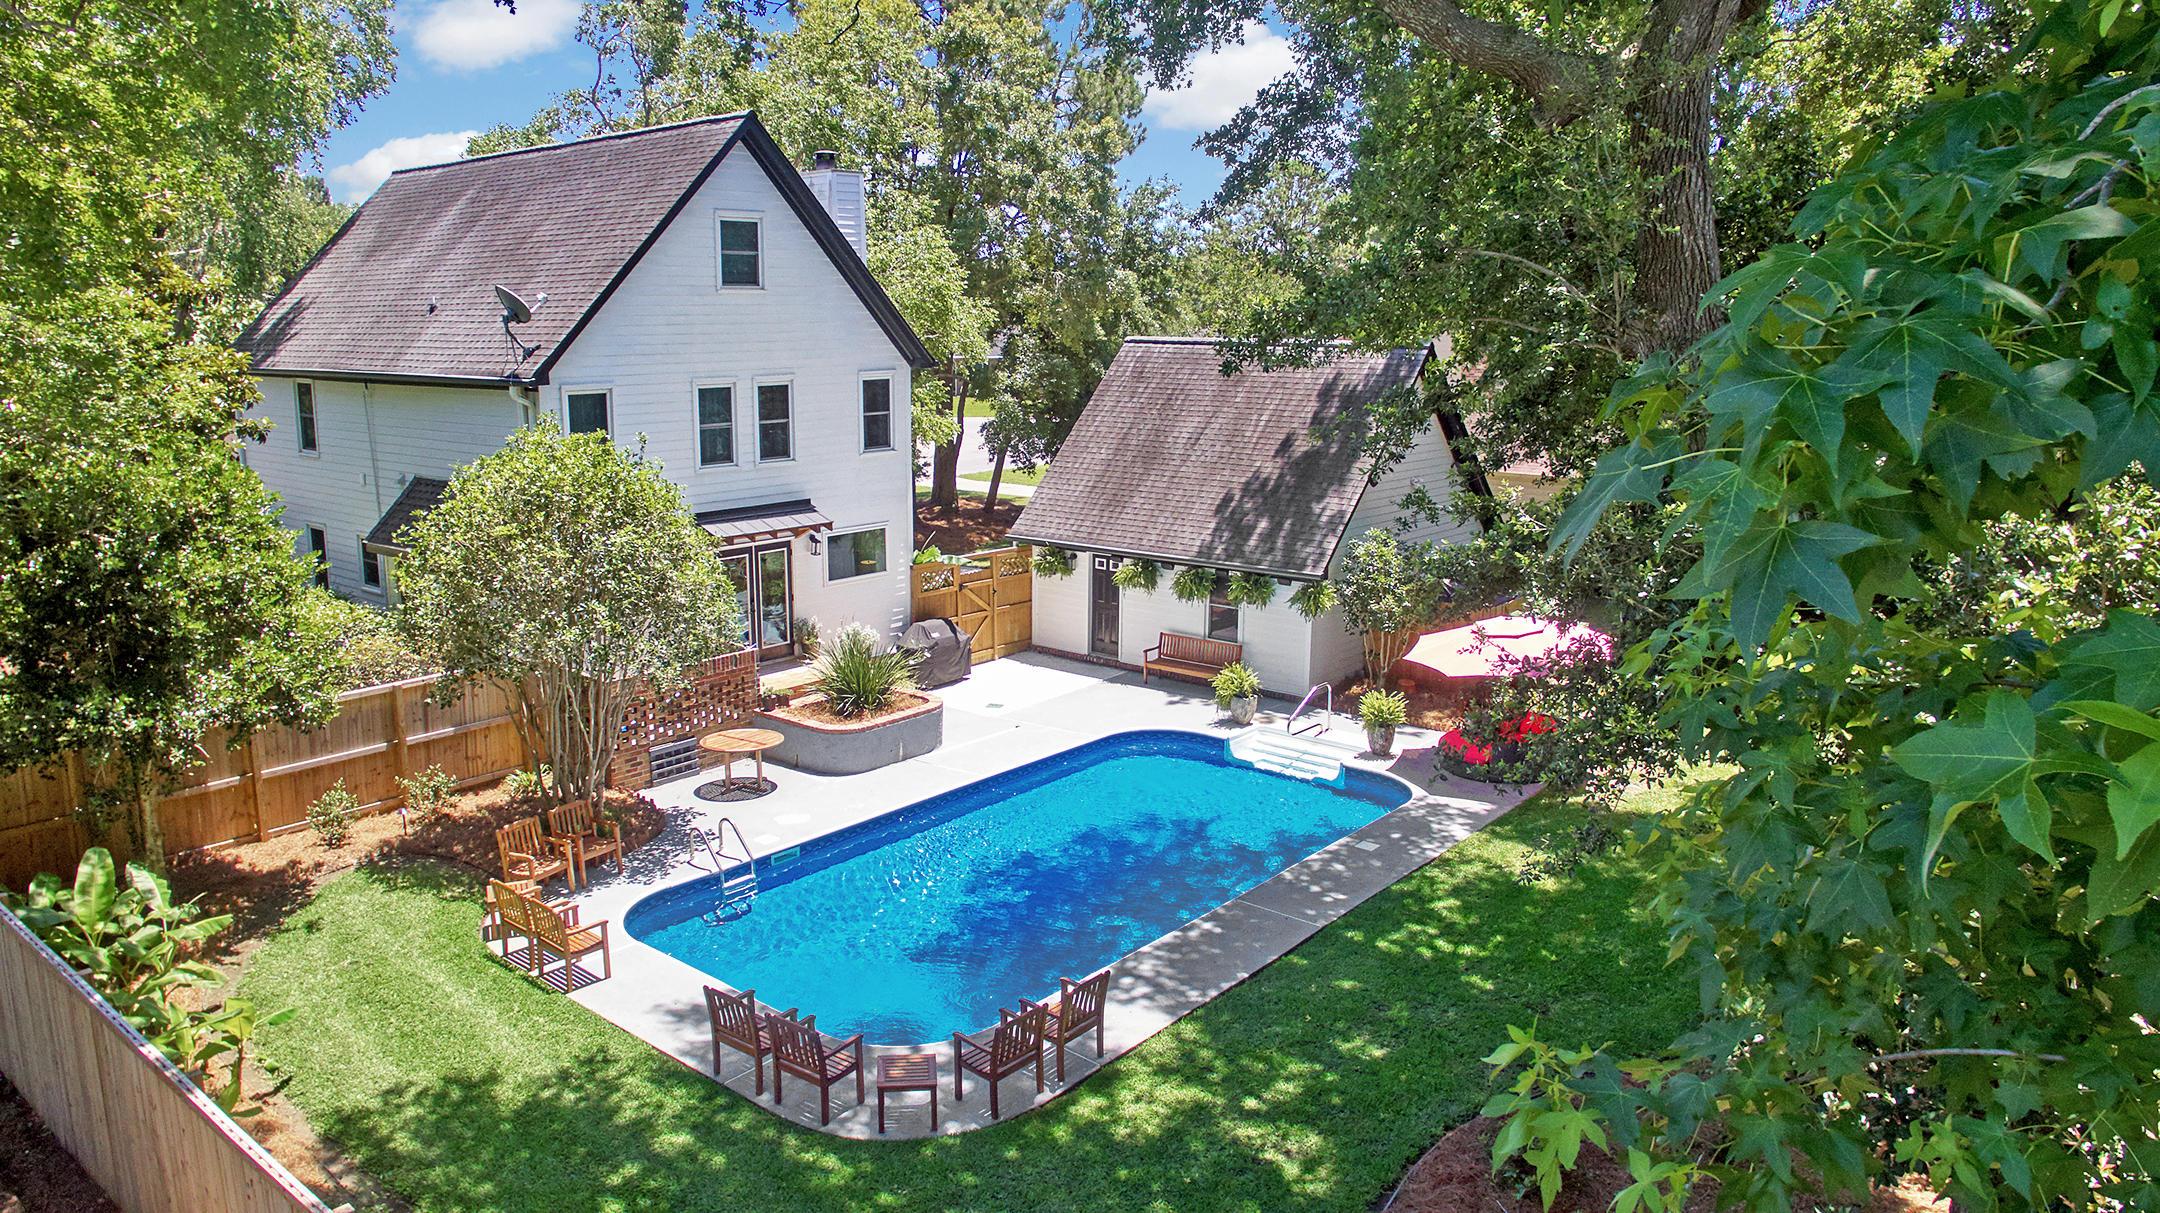 Stiles Point Plantation Homes For Sale - 699 Castle Pinckney, Charleston, SC - 13